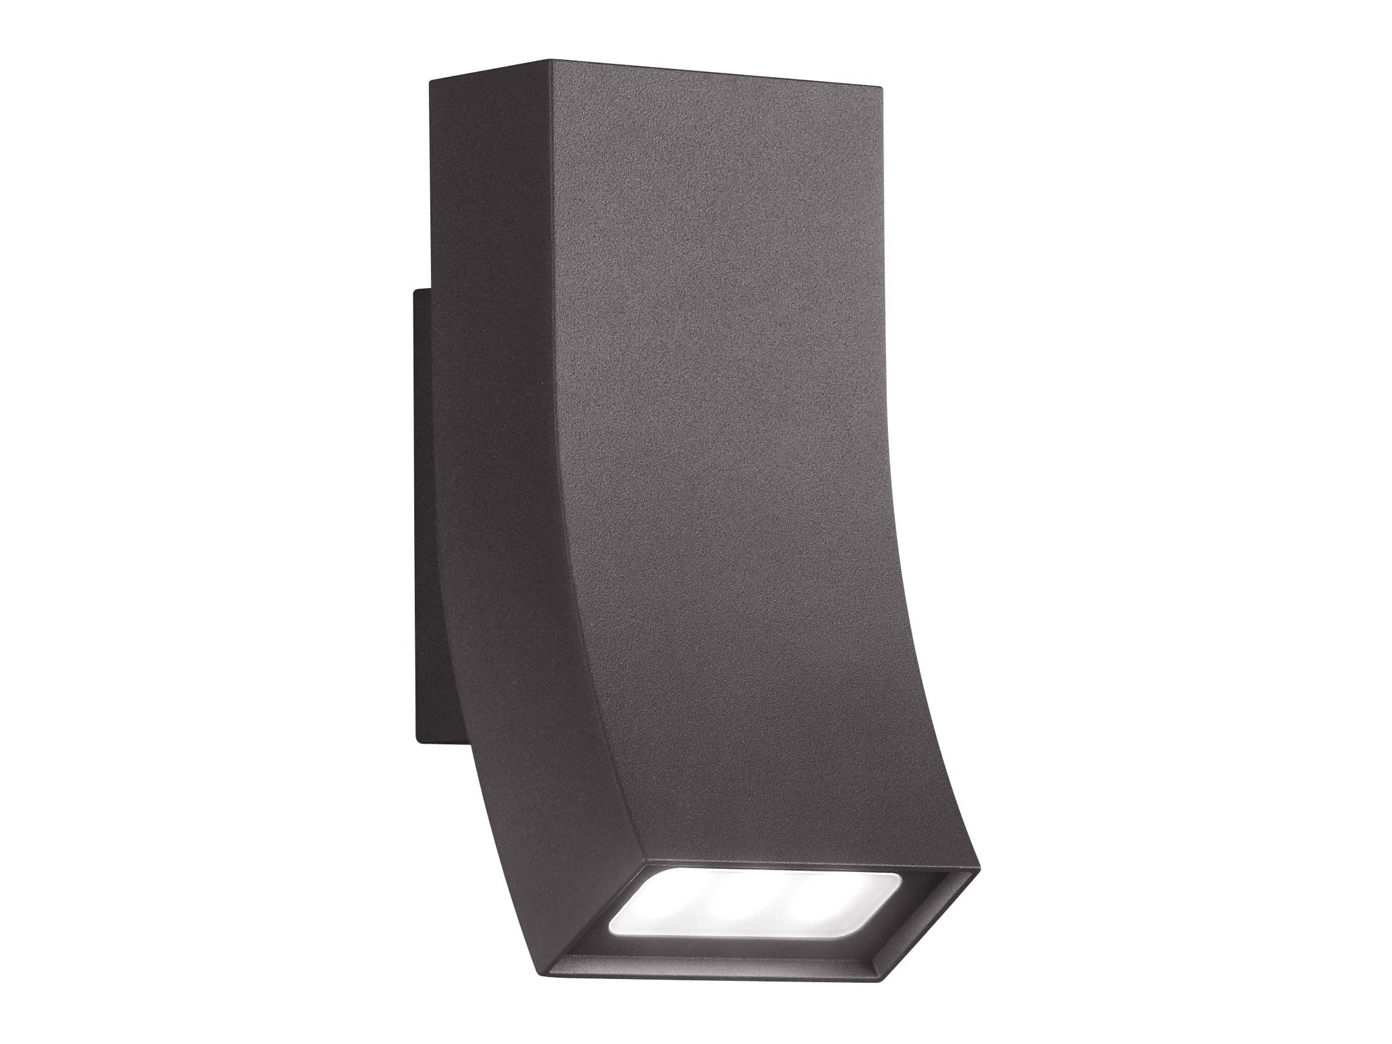 au en wandleuchte oka anthrazit up down 2 x 3 watt ip54. Black Bedroom Furniture Sets. Home Design Ideas